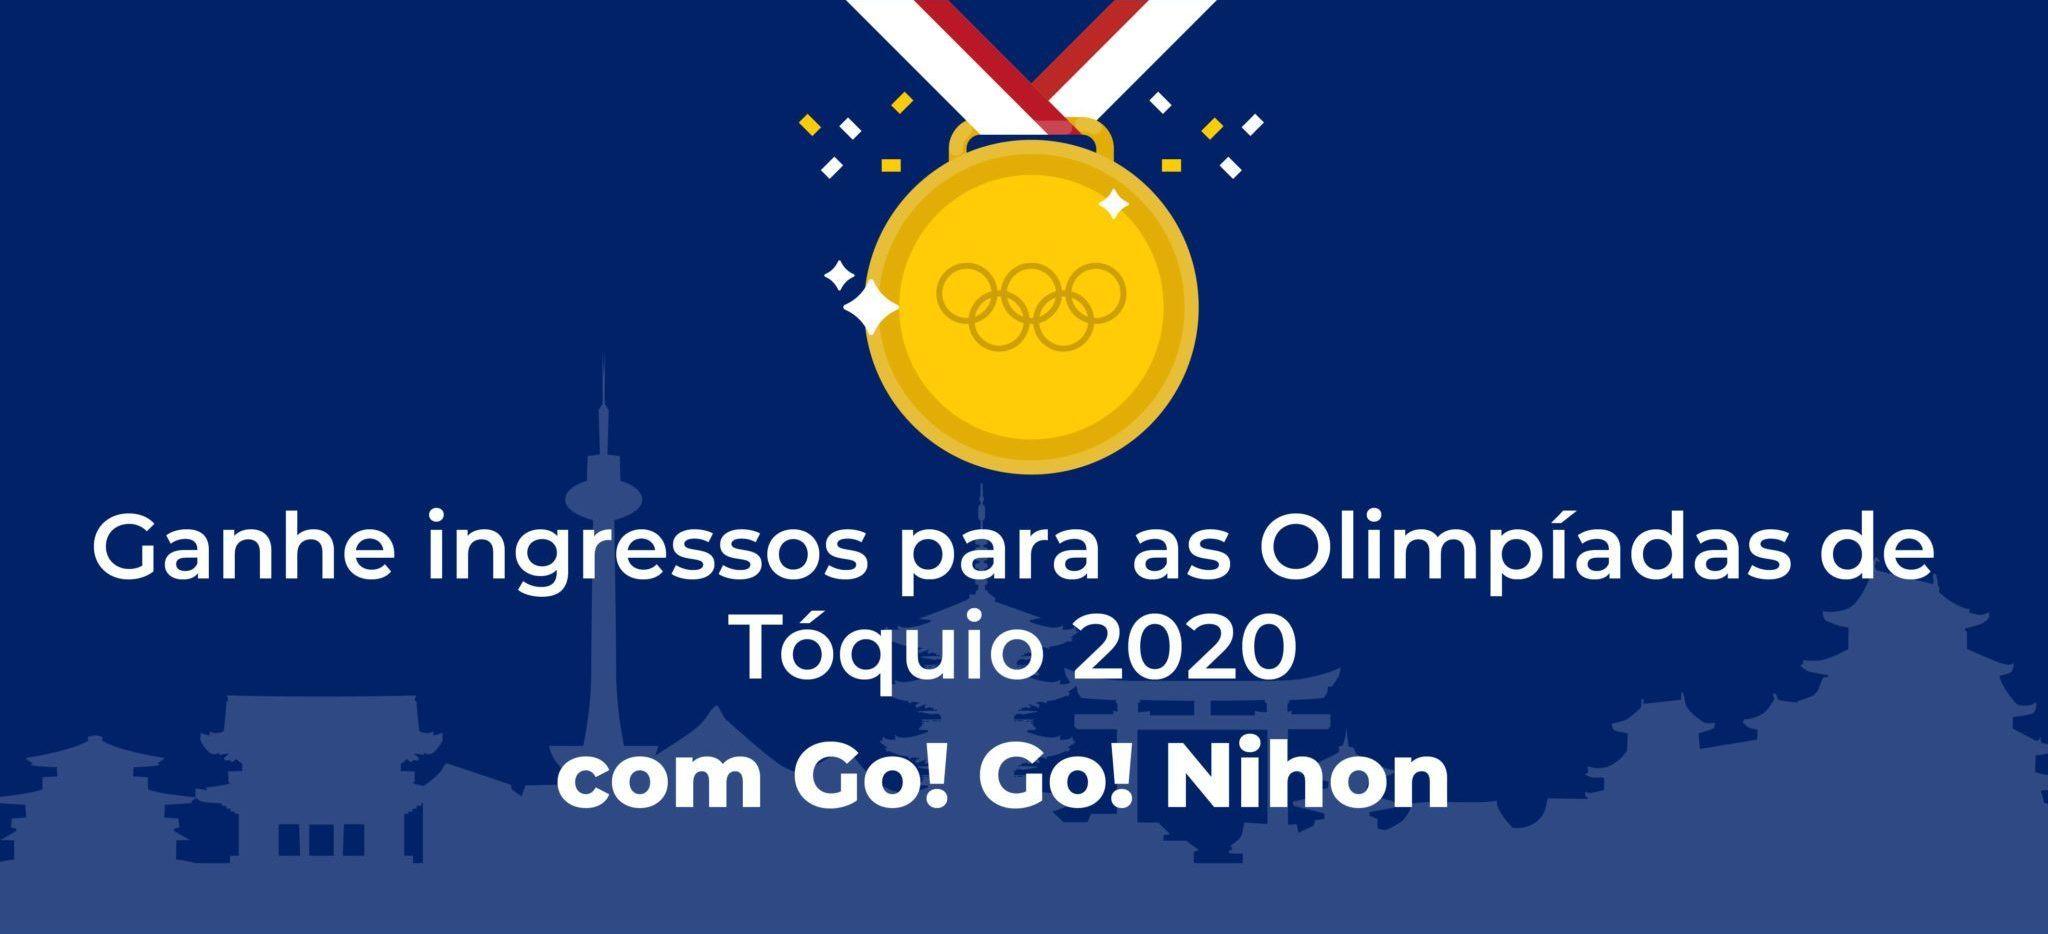 ingressos para as Olimpíadas de Tóquio 2020